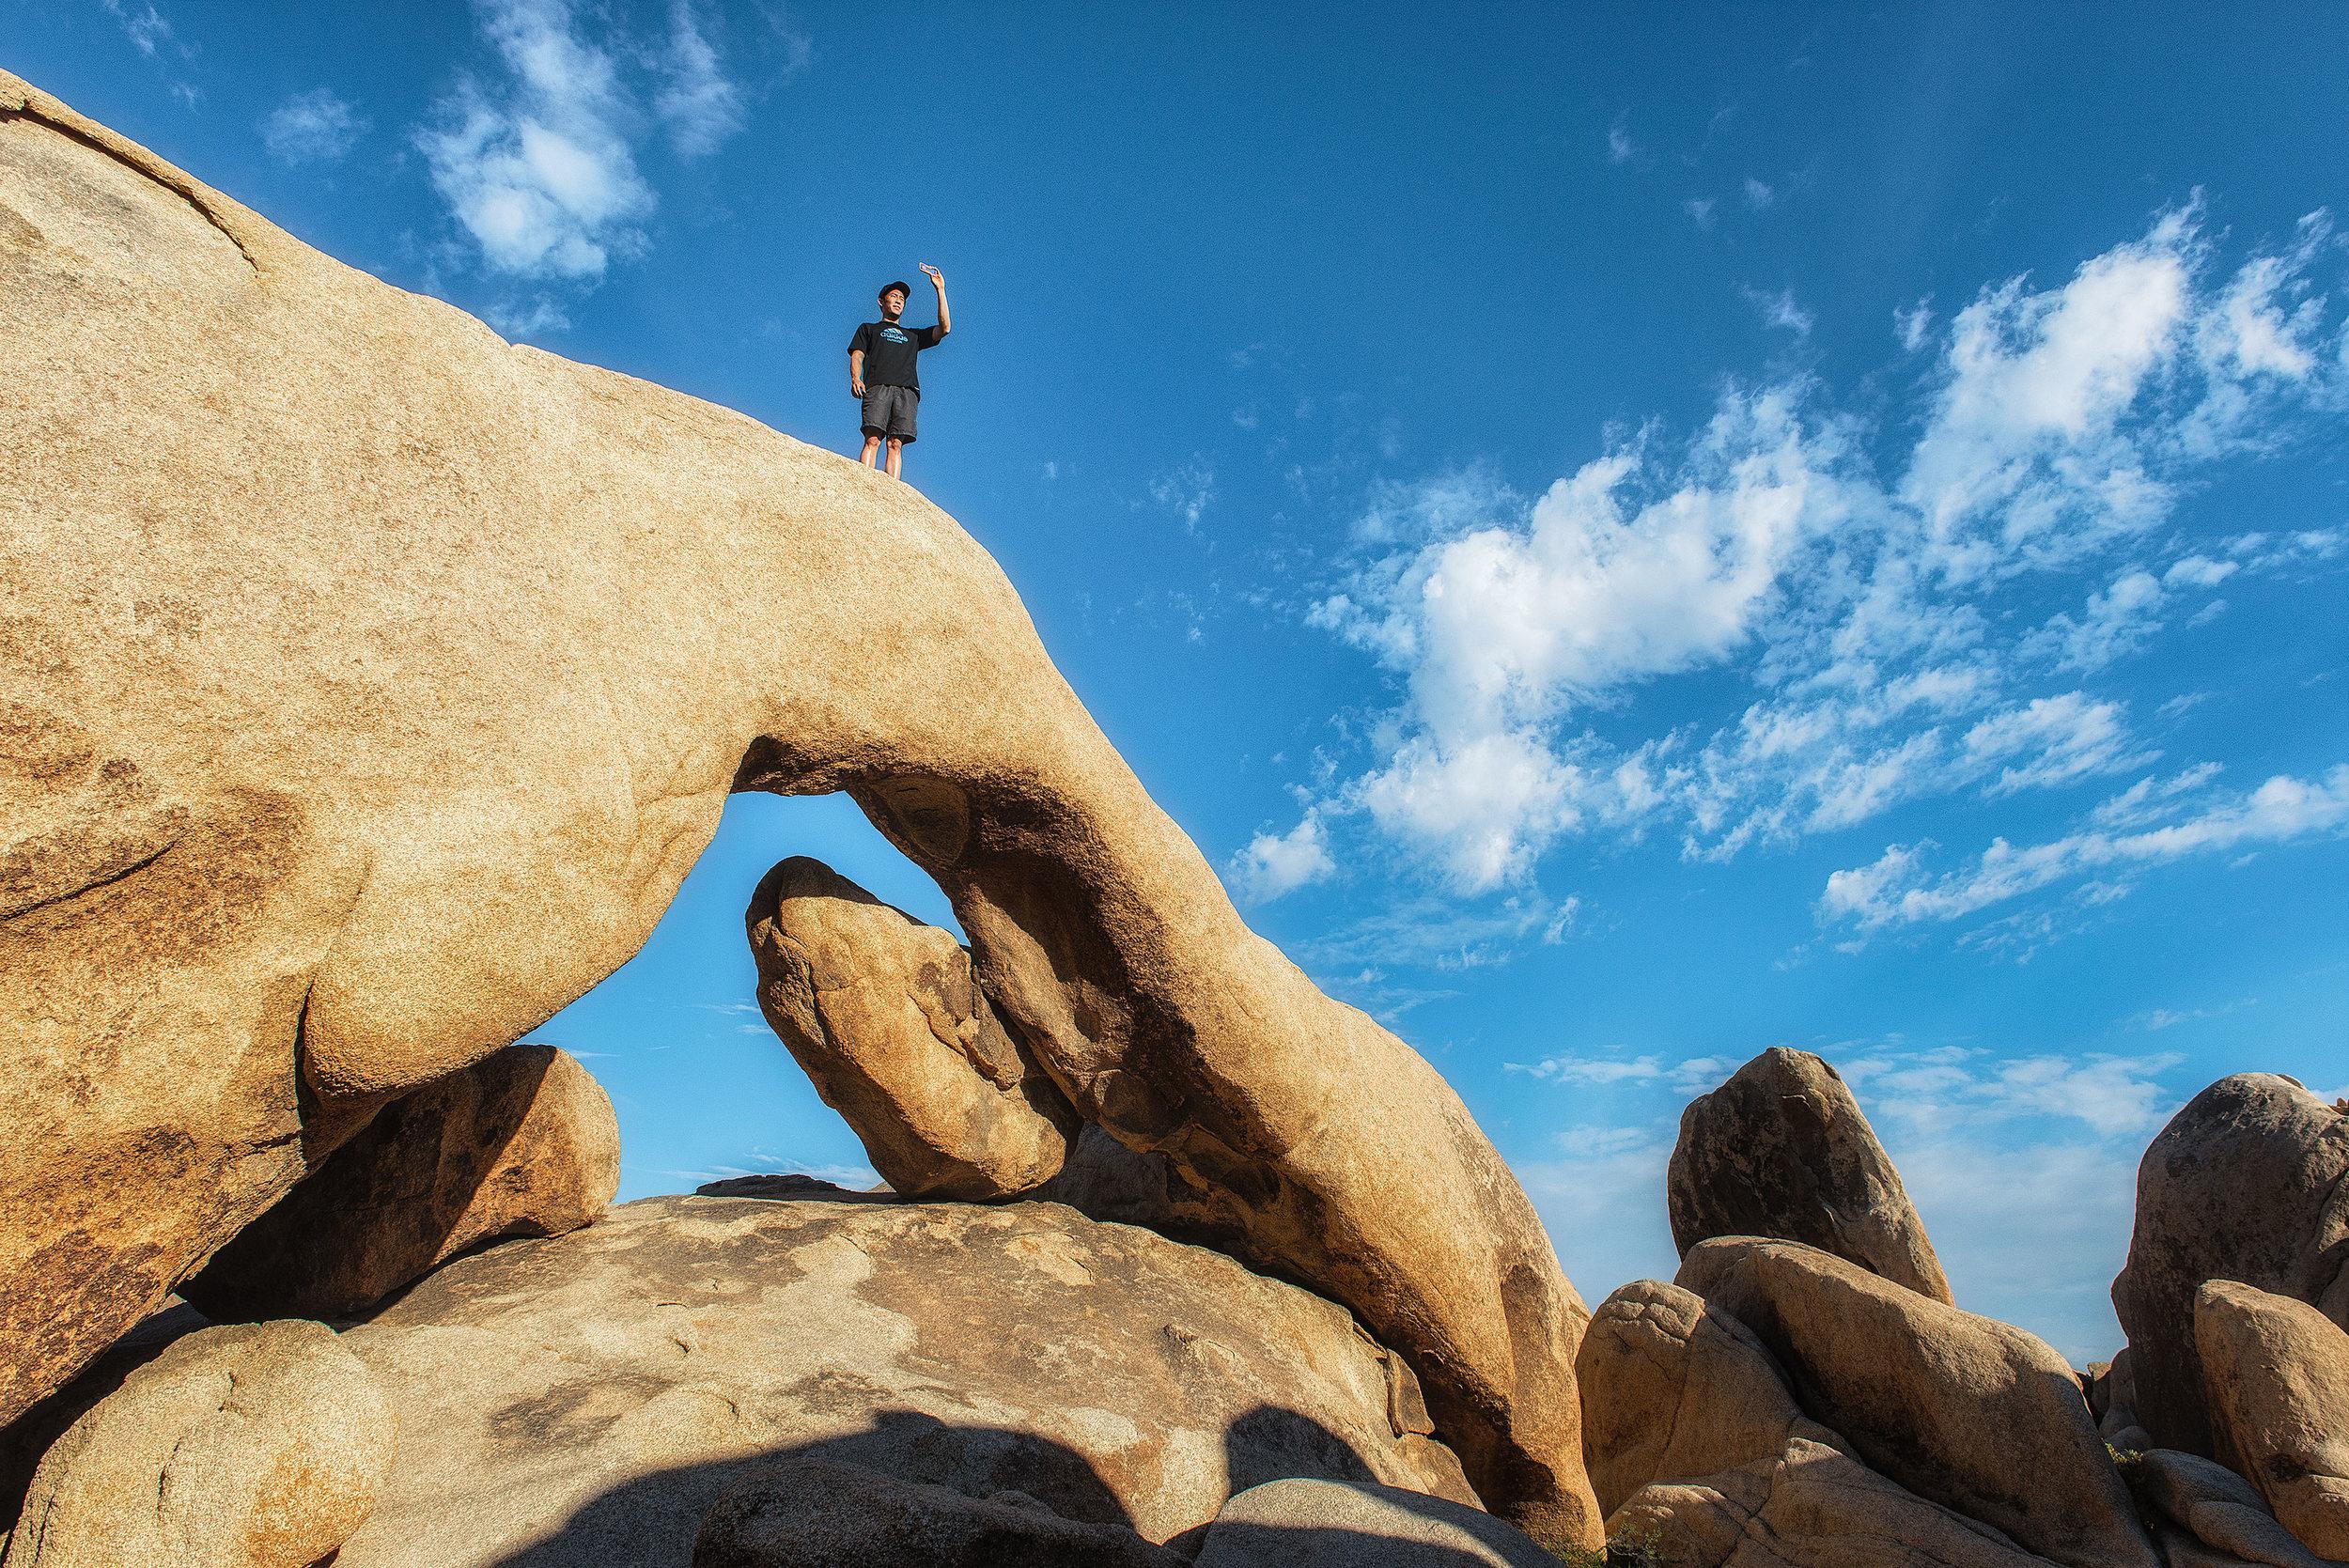 austin-trigg-joshua-tree-national-park-hiker-top-arch-rock-picture.jpg